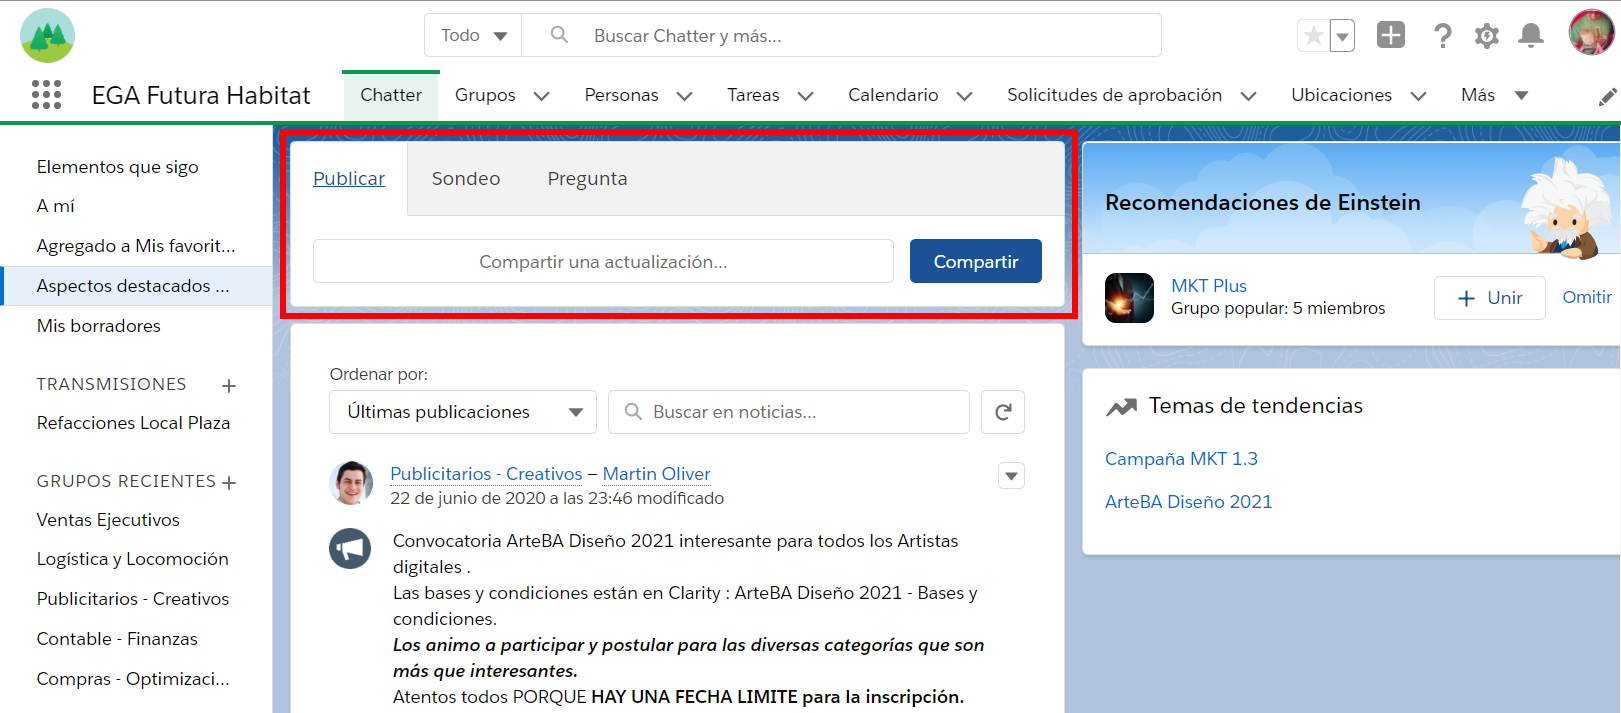 Publicador de Chatter Plataforma EGA Futura ERP Nube